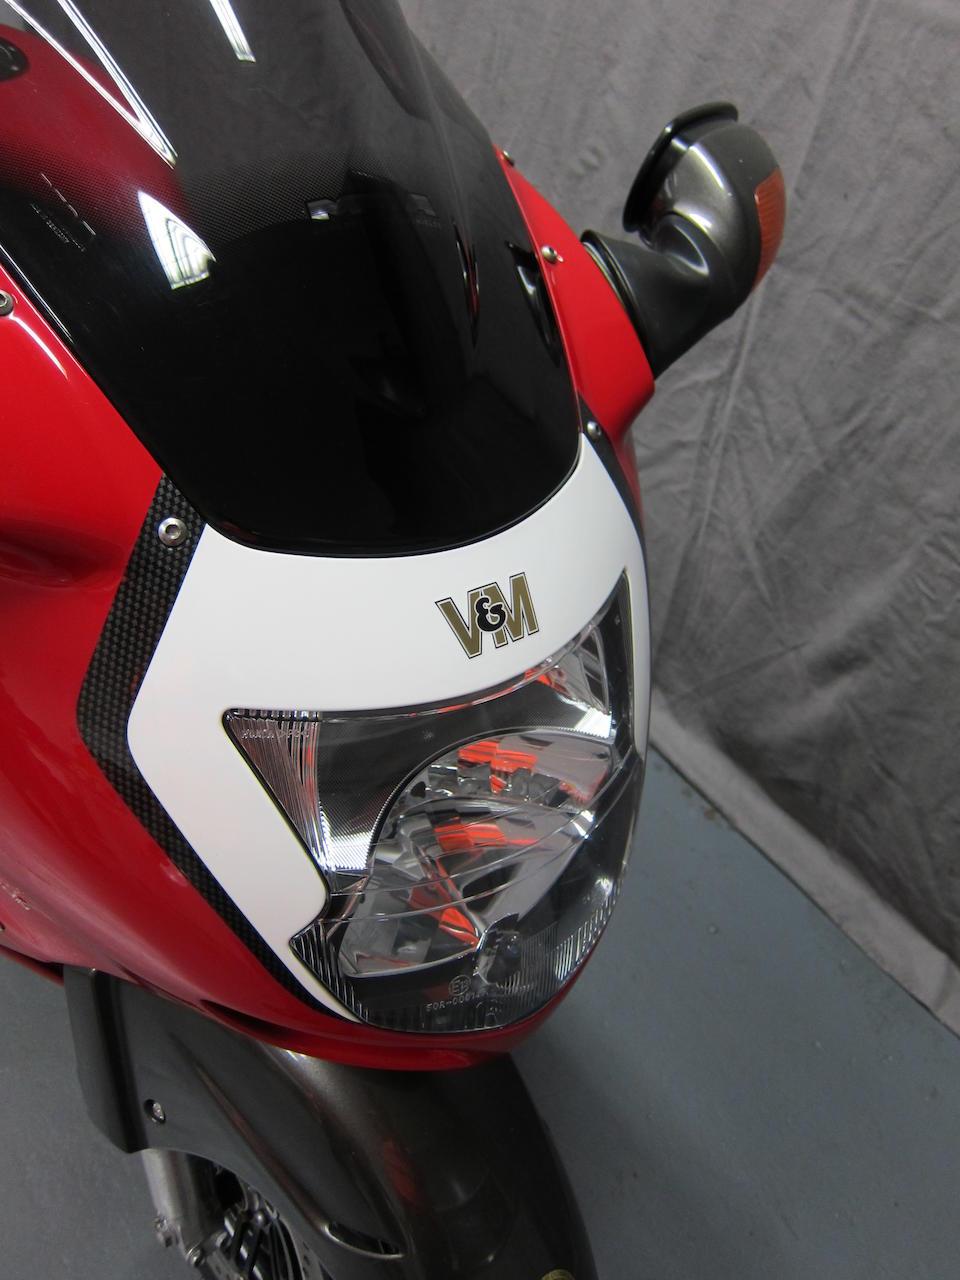 1,180 miles from new,1999 Honda CBR1200XX Super Blackbird 50th Anniversary Limited Edition Frame no. JH25C35A1WM110020 Engine no. SC35E3005106